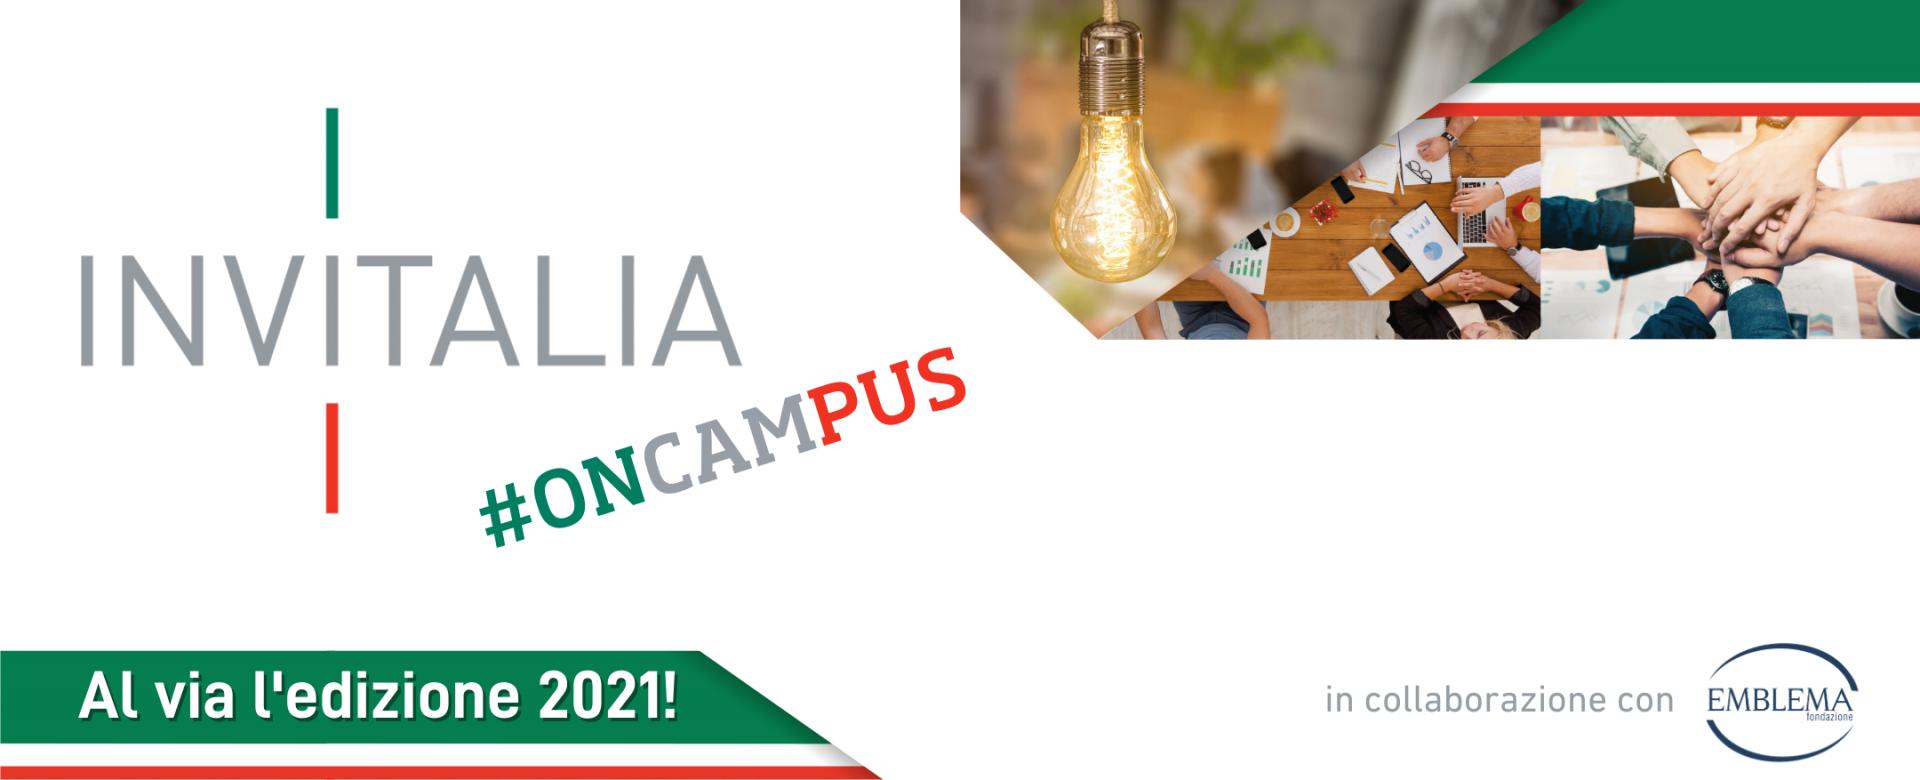 12.04.2021 - Torna Invitalia #onCampus!